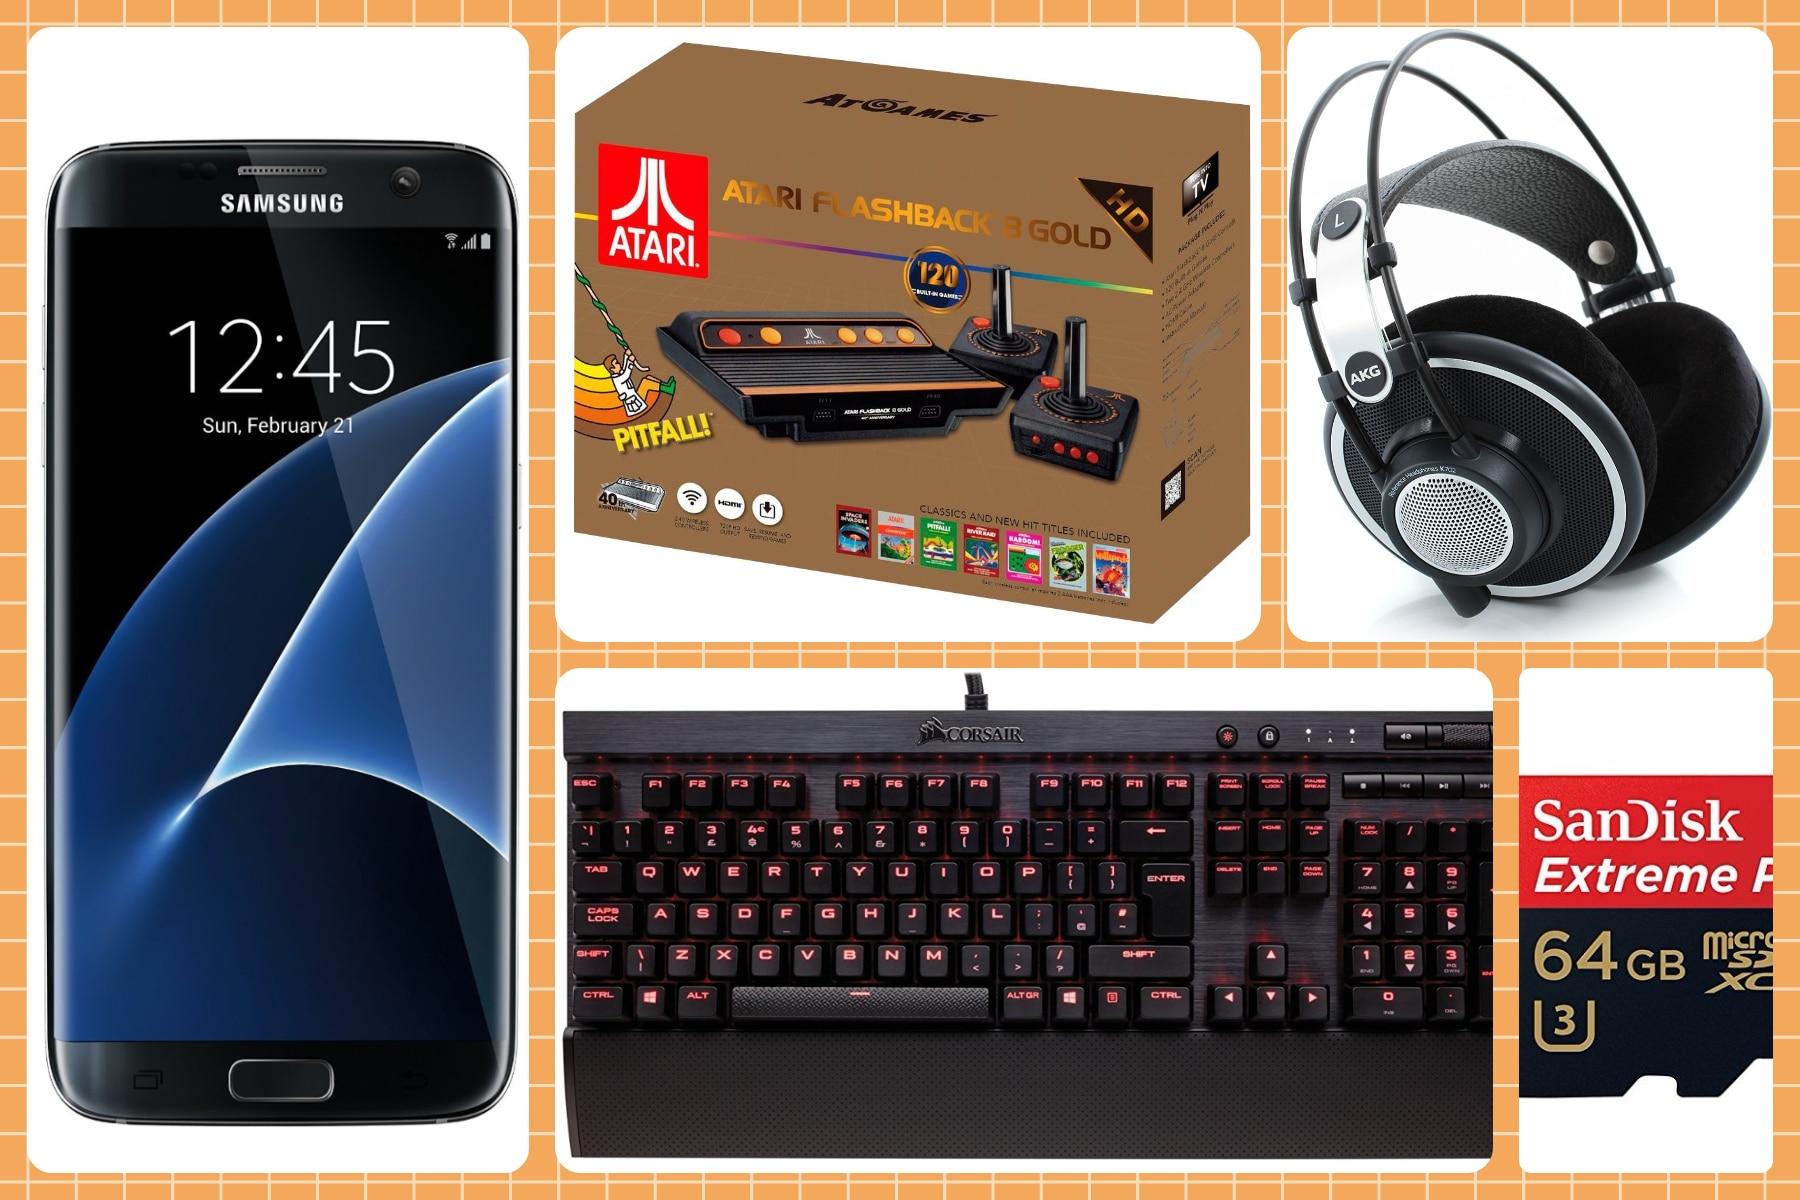 Huawei Mate 10 Pro a meno di 680€, mouse gaming, cinafonini e cuffie in offerta su Amazon! - image migliori-offerte-12-gennaio-2018 on http://www.zxbyte.com